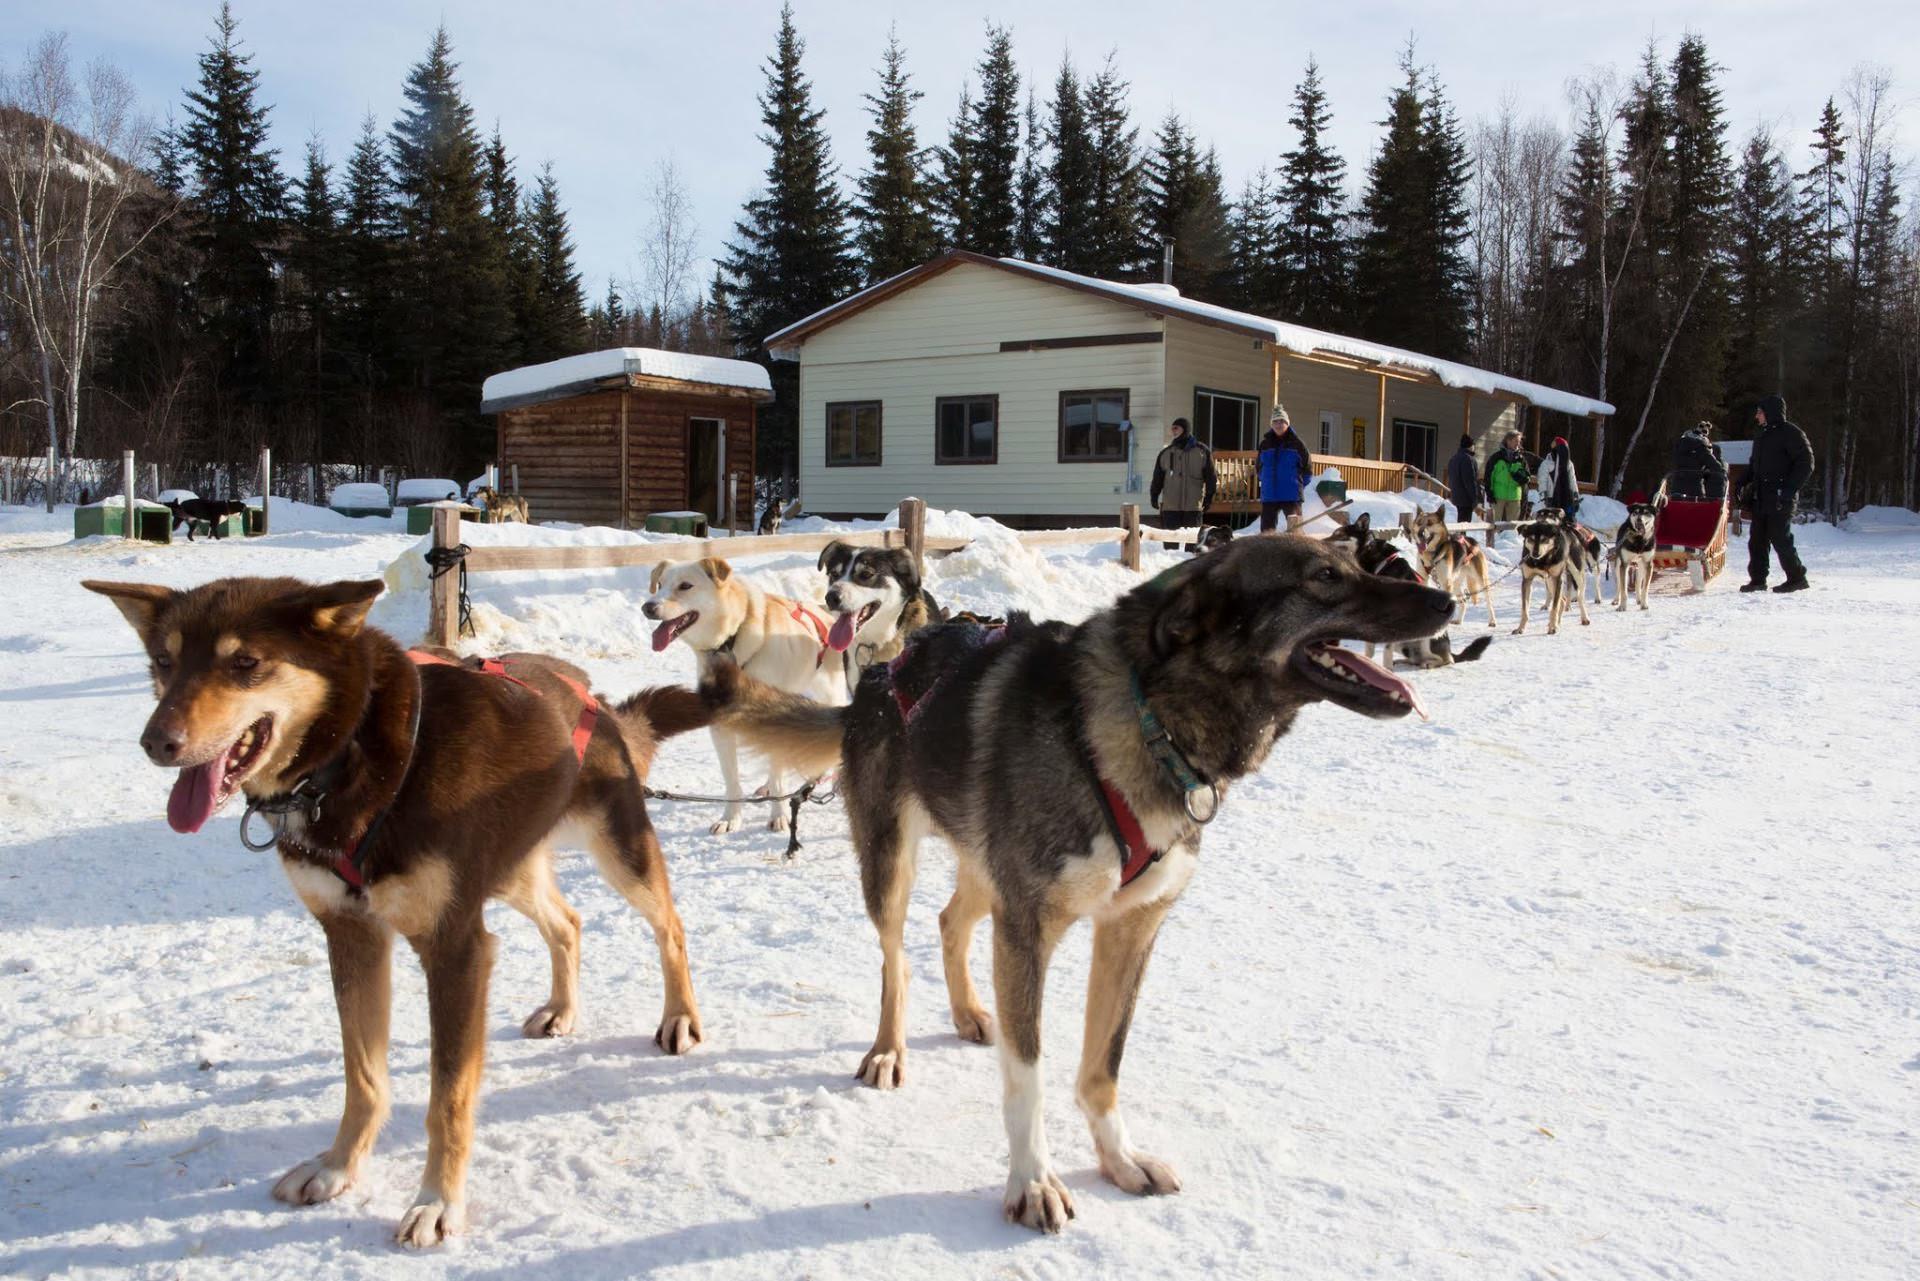 Alaska 8 image